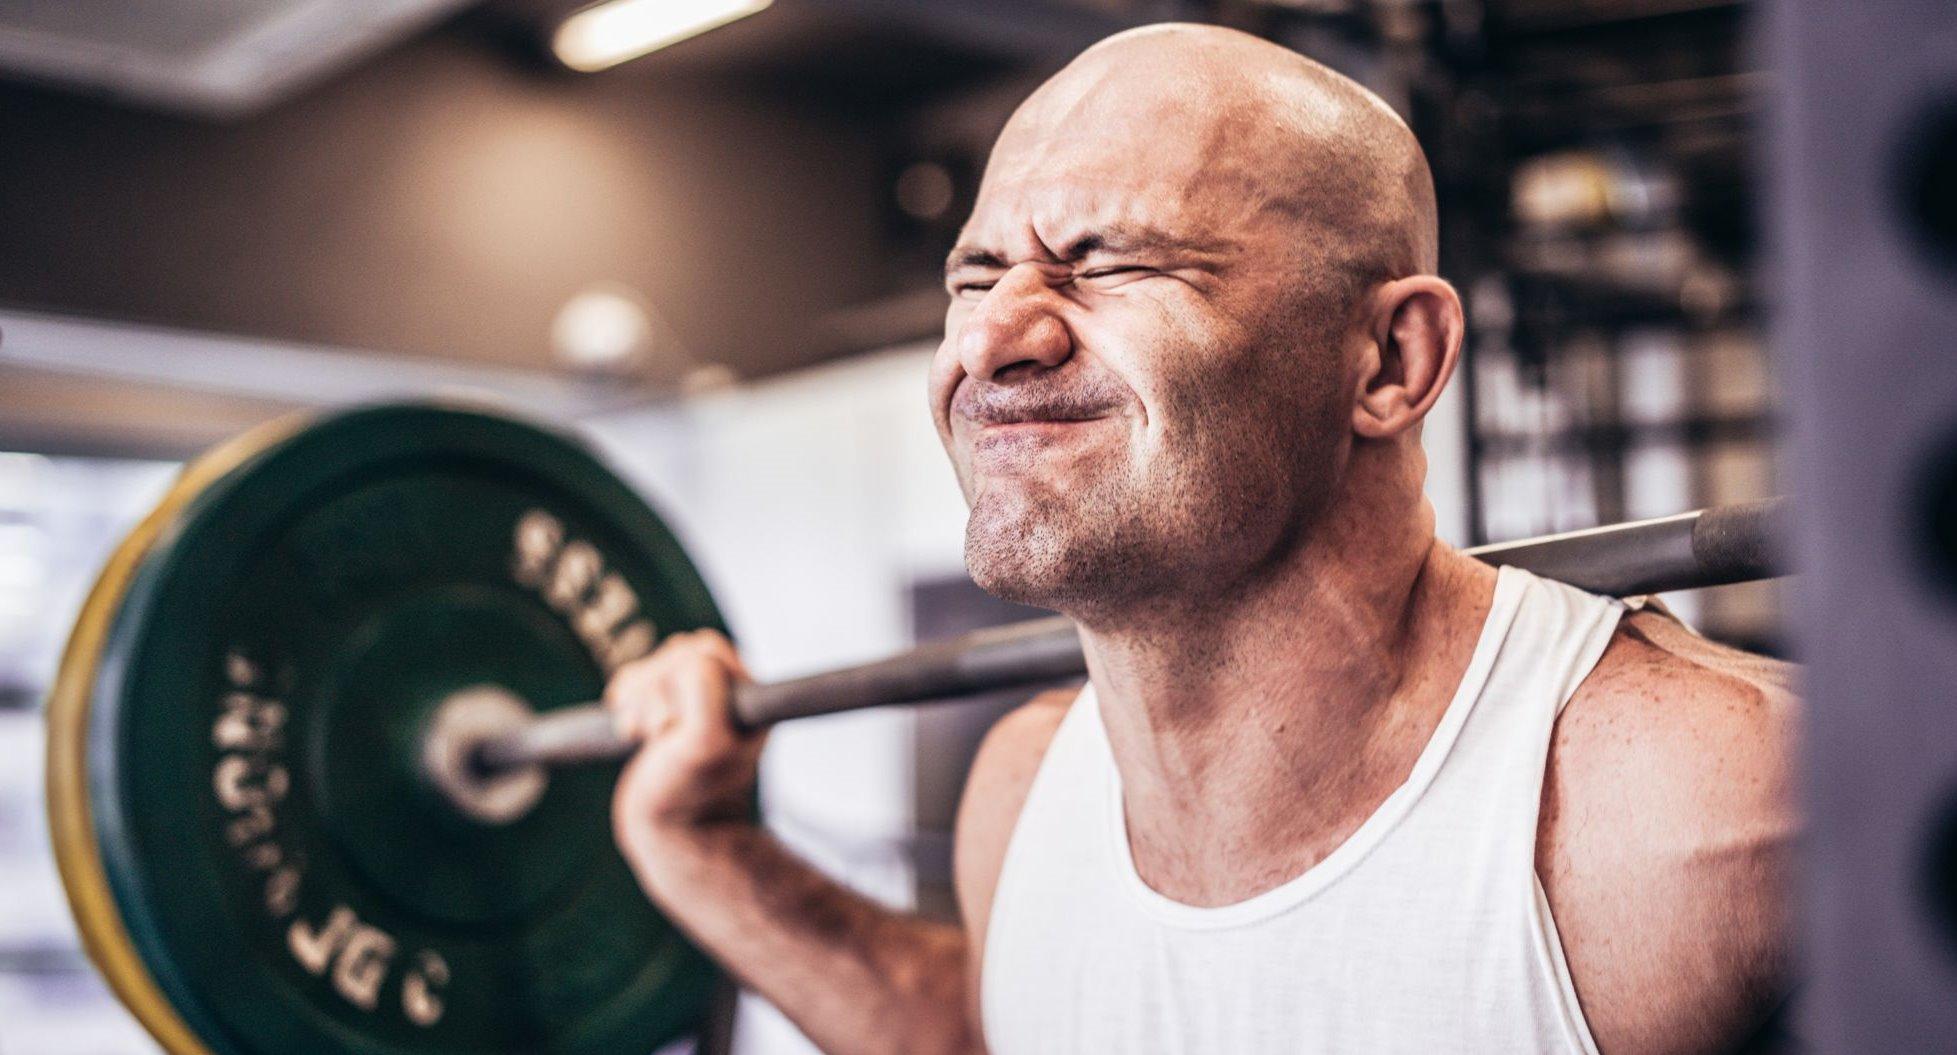 greatest sport supplement - strength training